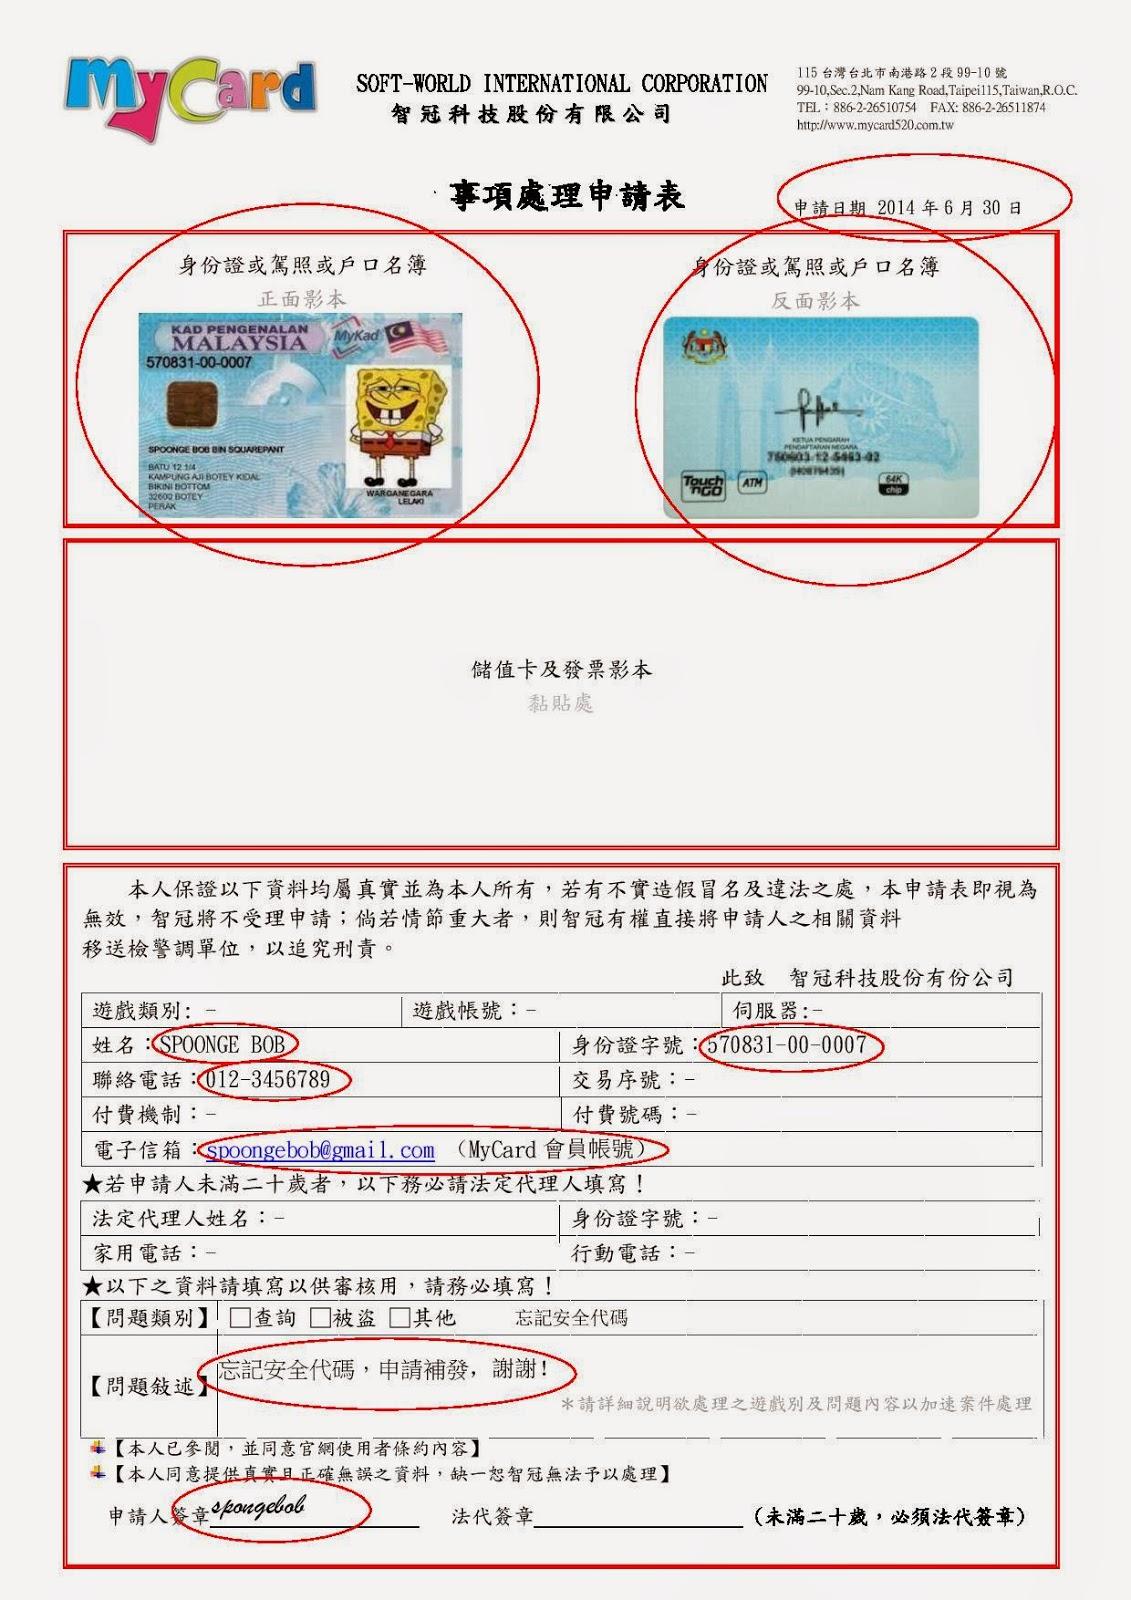 MyCard Malaysia: MyCard會員中心安全代碼查詢流程教學 Forgotten security code?